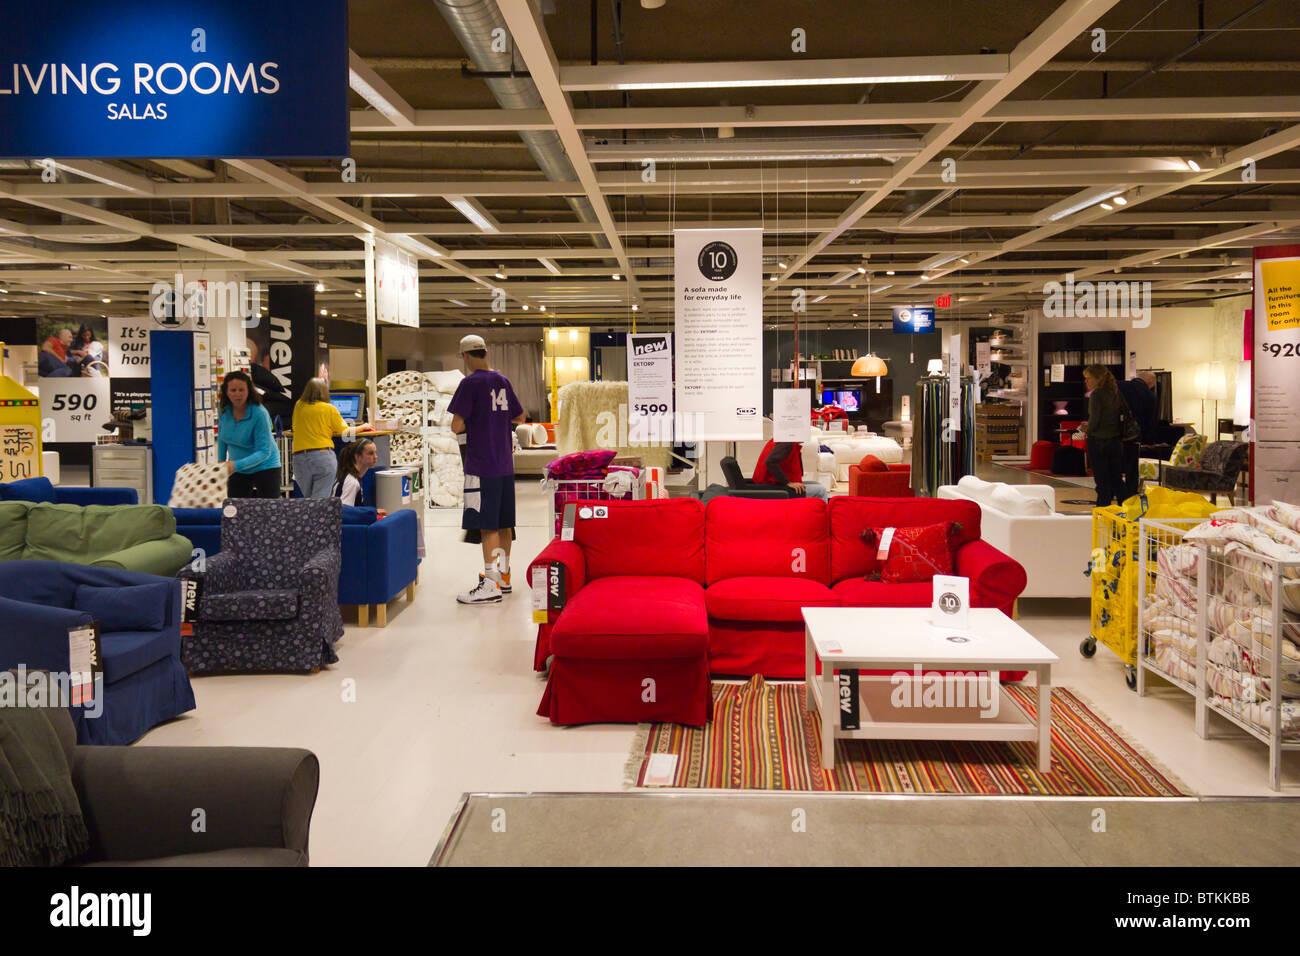 Charmant IKEA Furniture Warehouse Store, Plymouth Meeting, Pennsylvania, USA